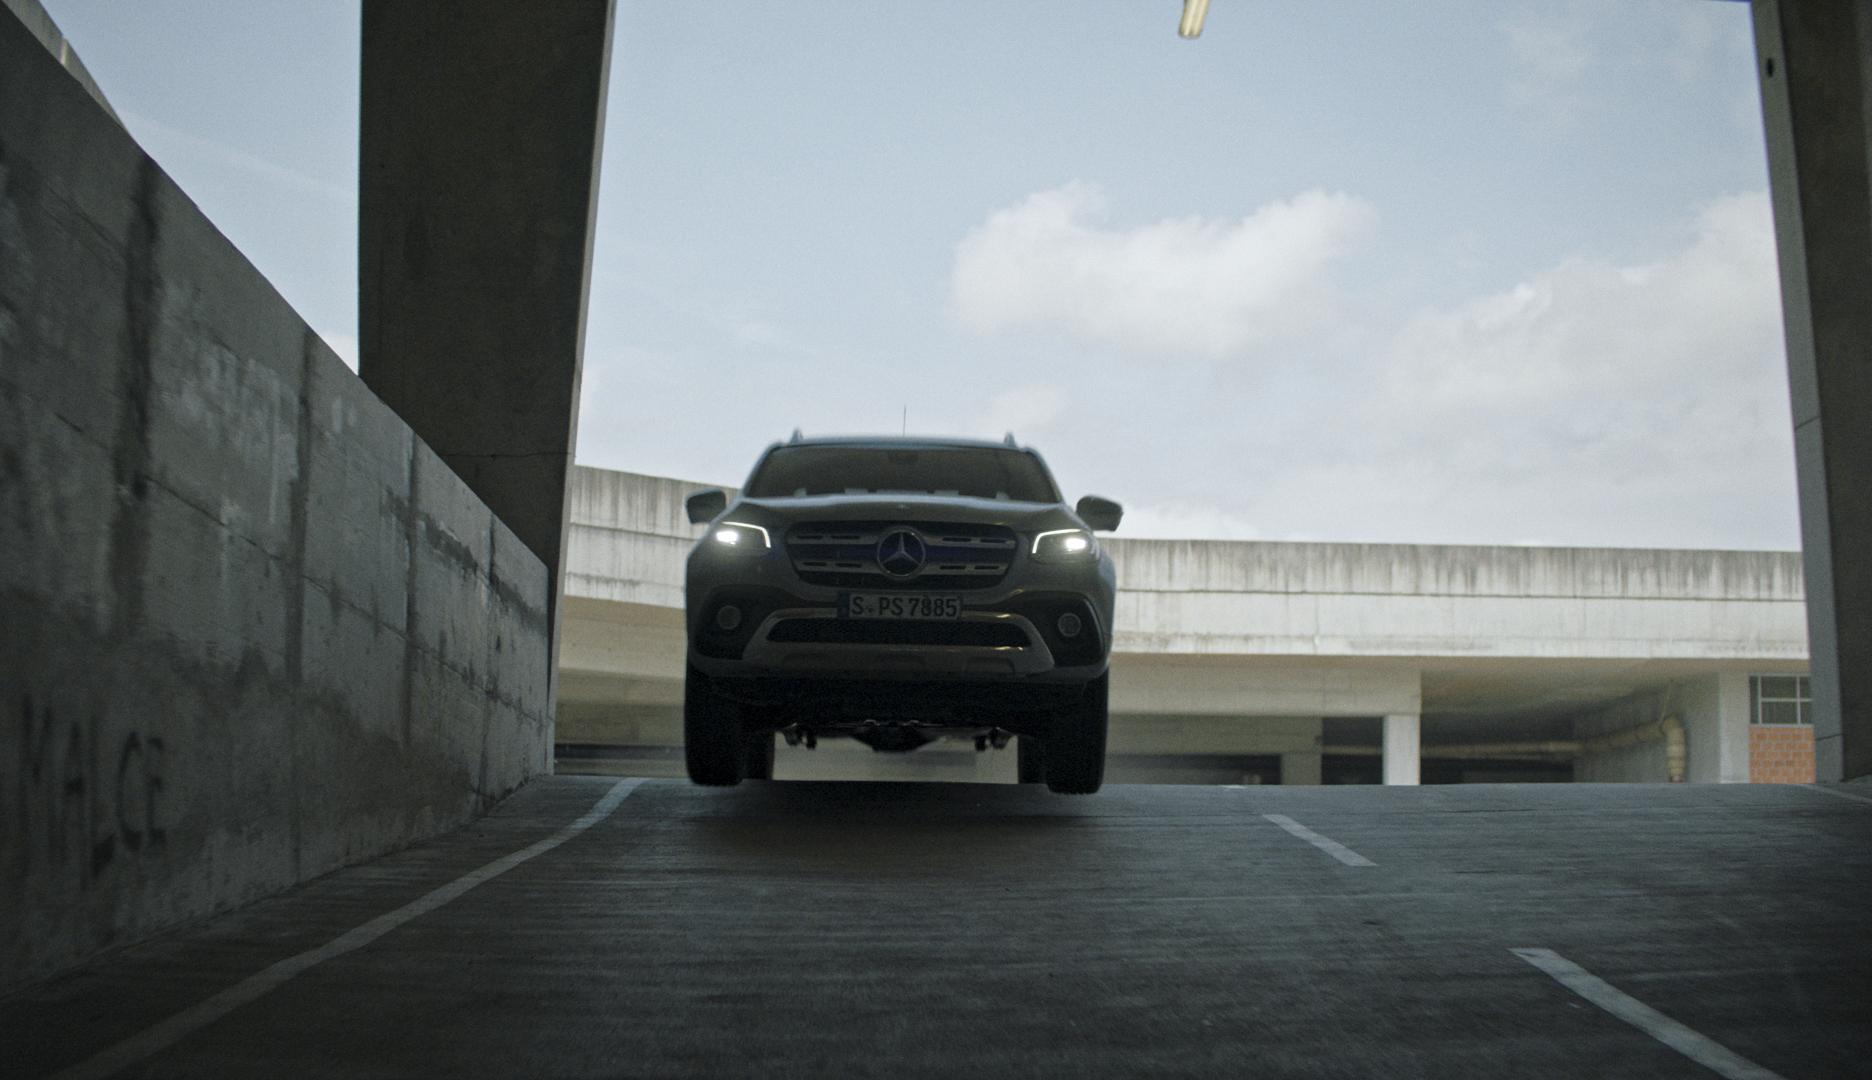 Mercedes X-Class - Eyes_1.5.1.jpg